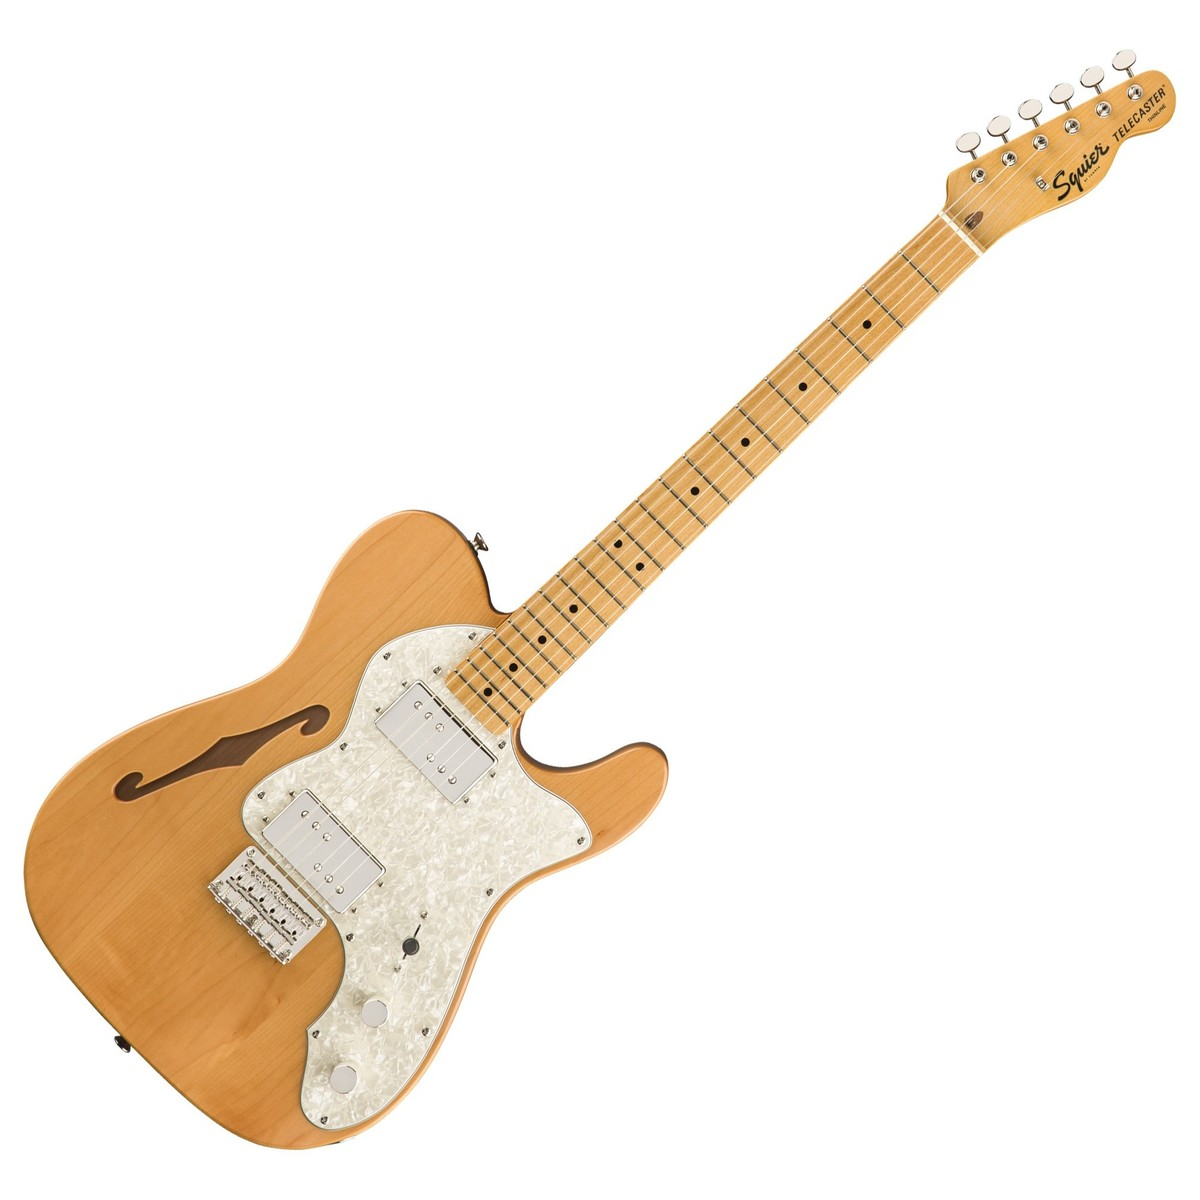 Fender Classic '72 Telecaster Thinline Natural